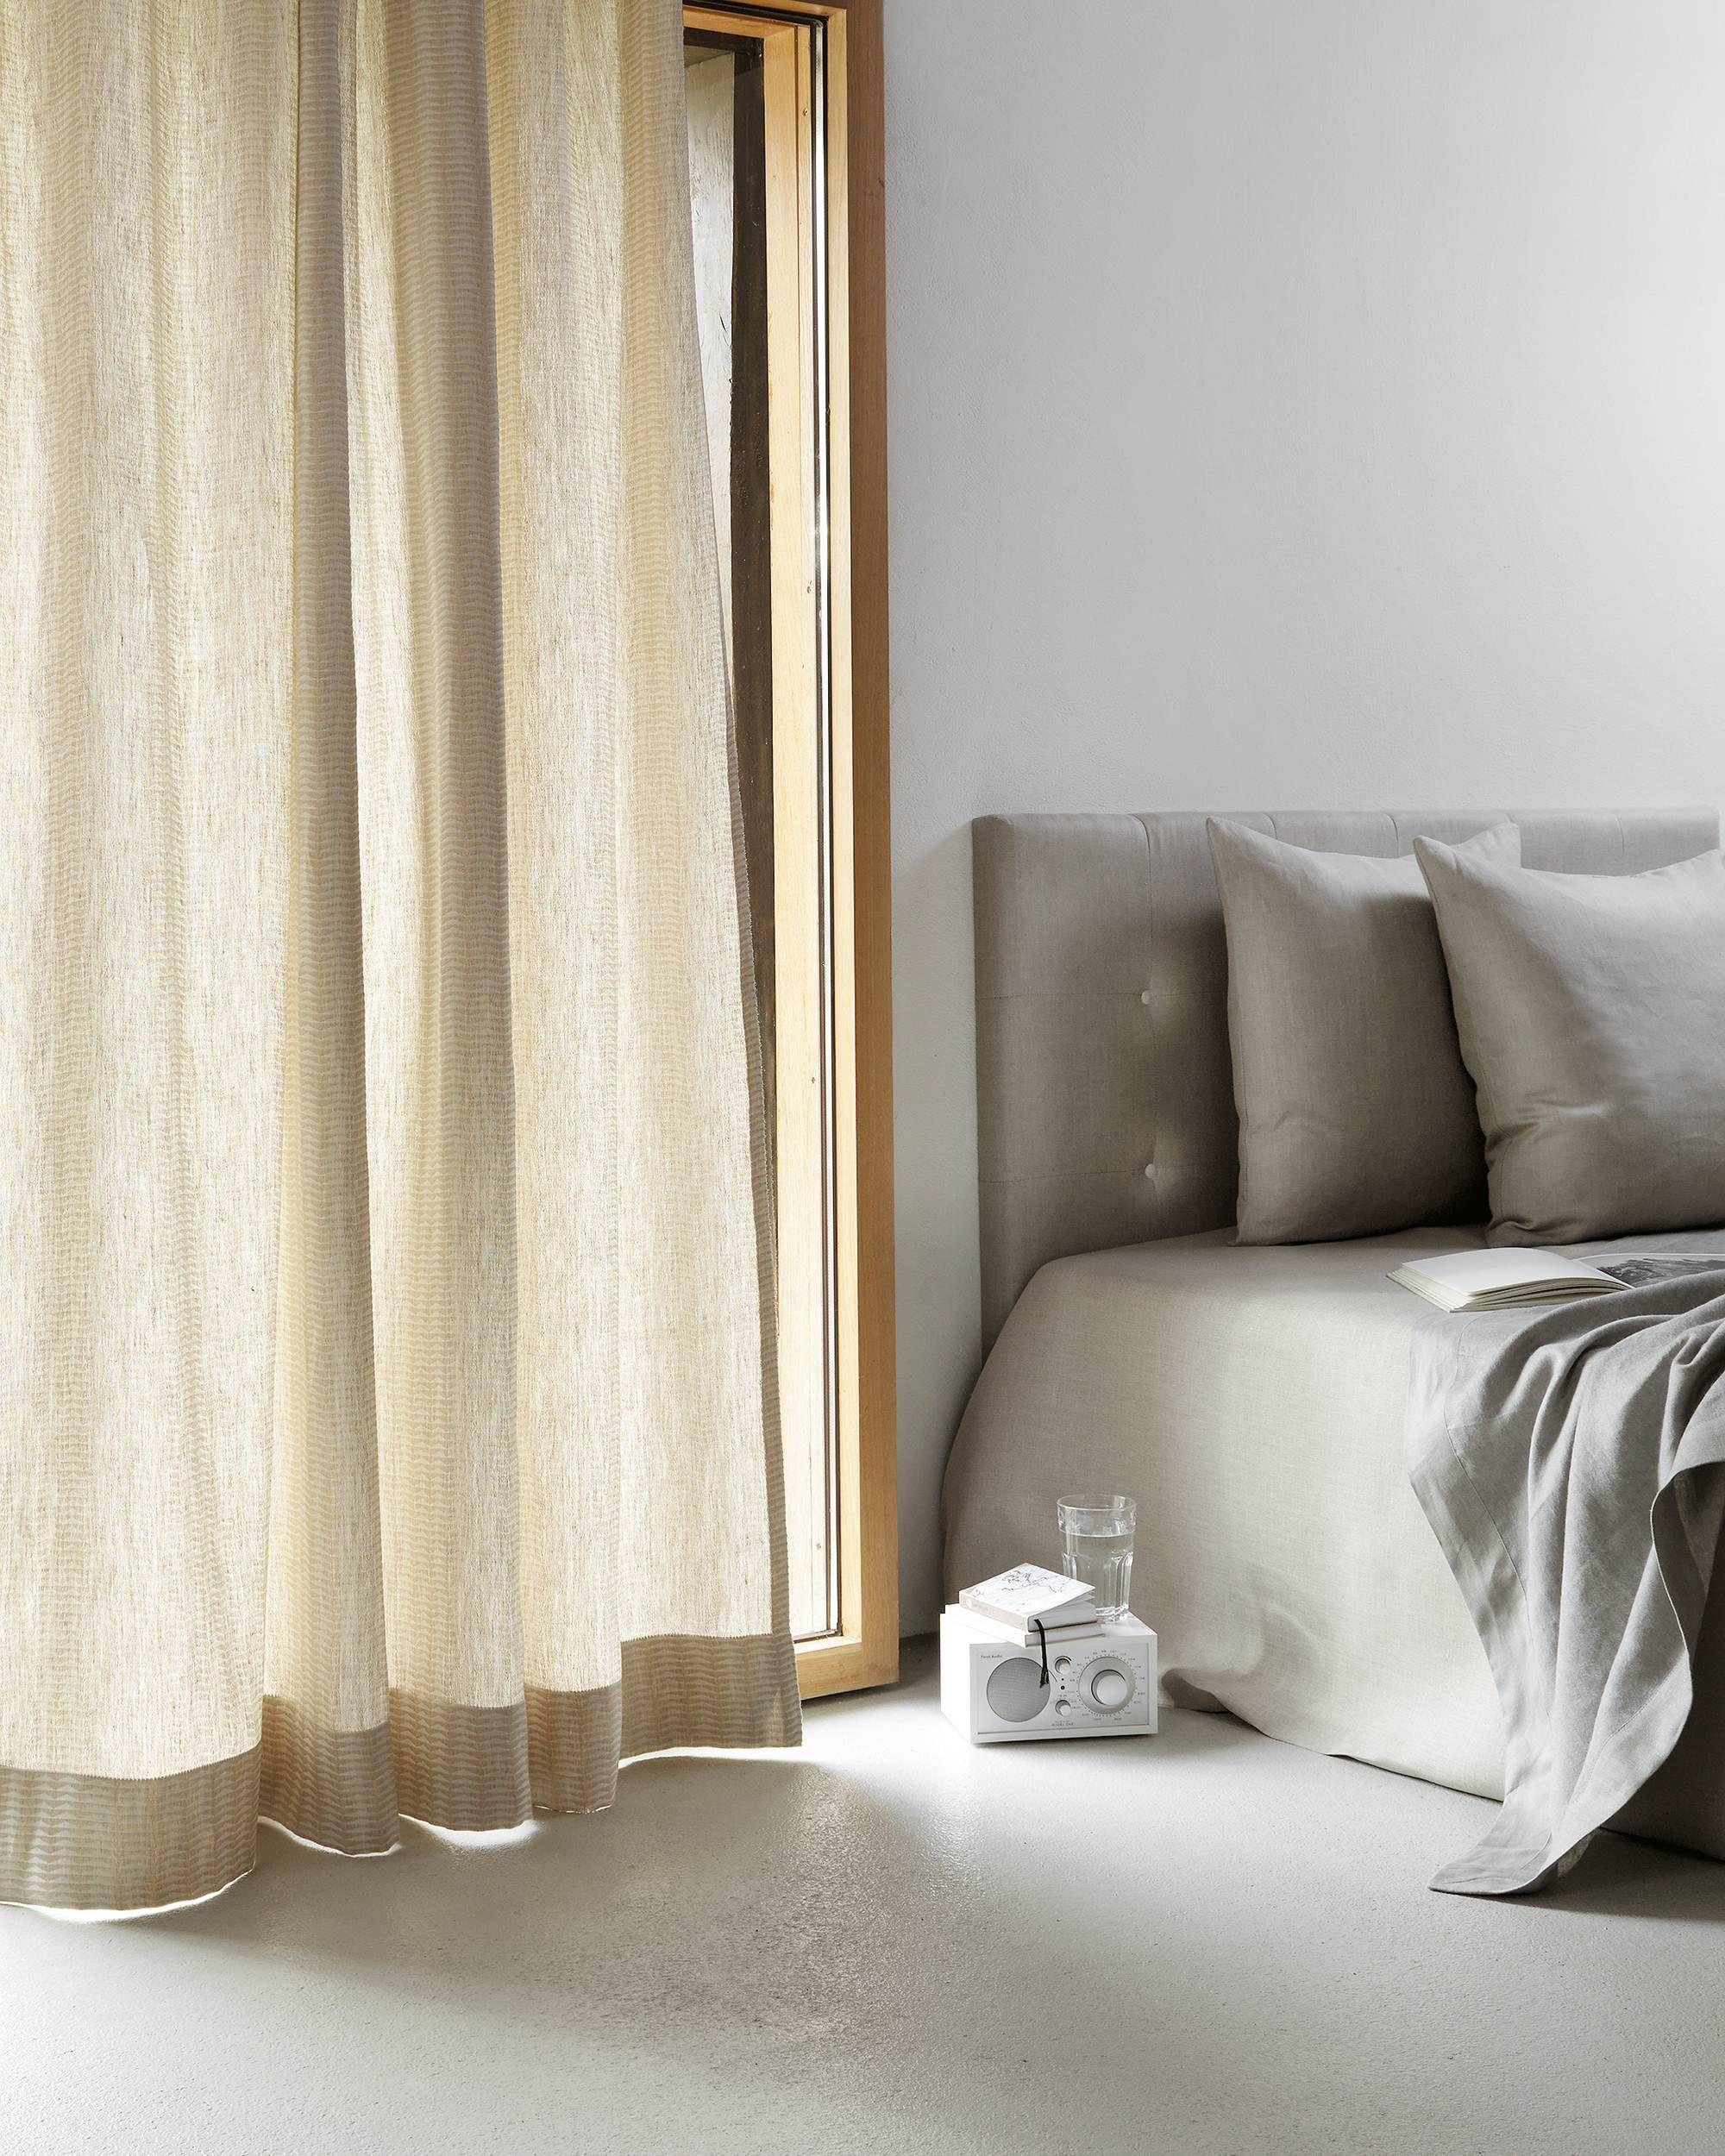 Cration Baumann SILENOS interior design curtain